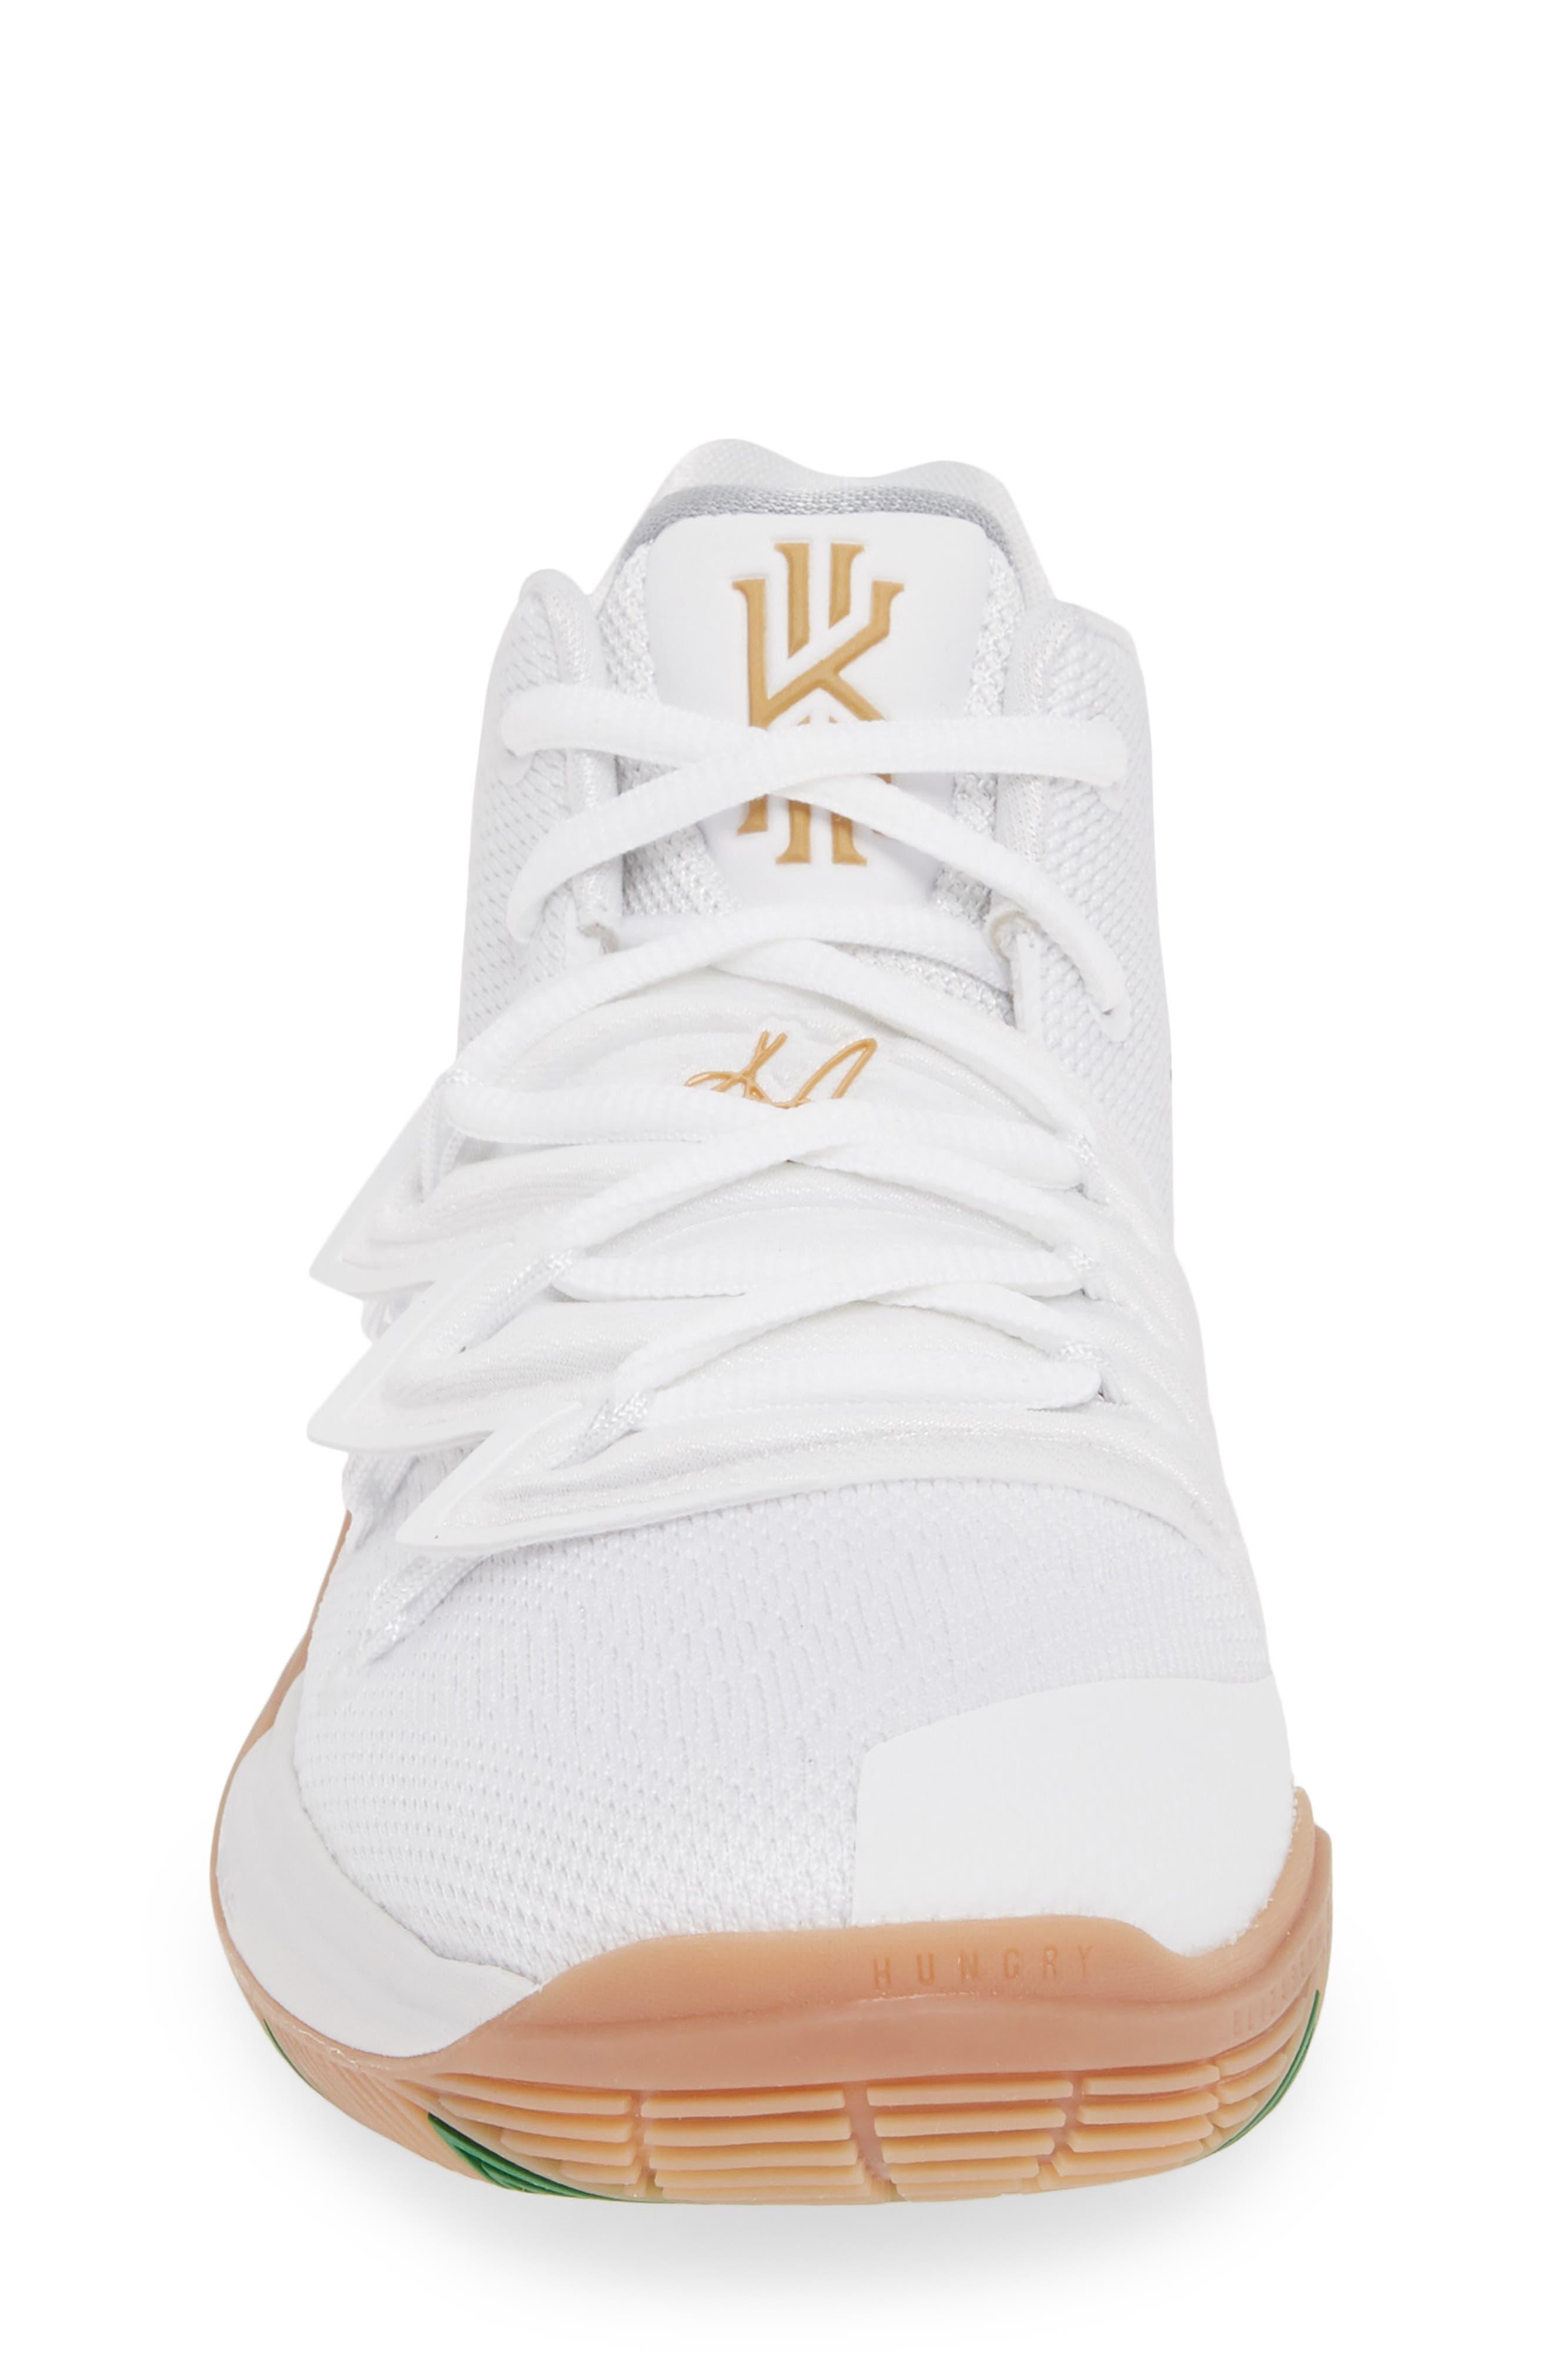 NIKE, Kyrie 5 Basketball Shoe, Alternate thumbnail 4, color, WHITE/ METALLIC GOLD-PLATINUM